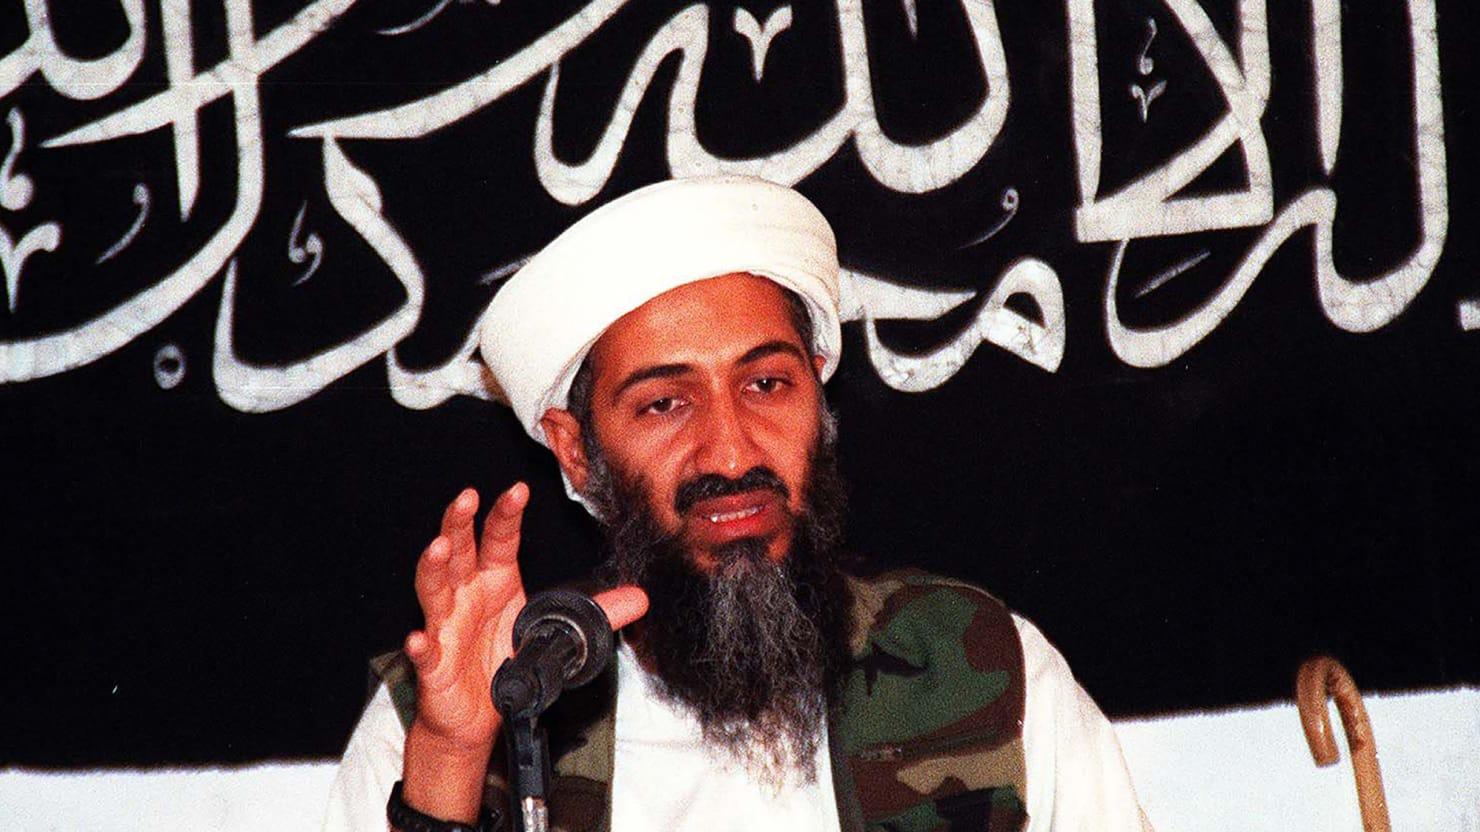 Osama bin laden suck my news magnificent idea